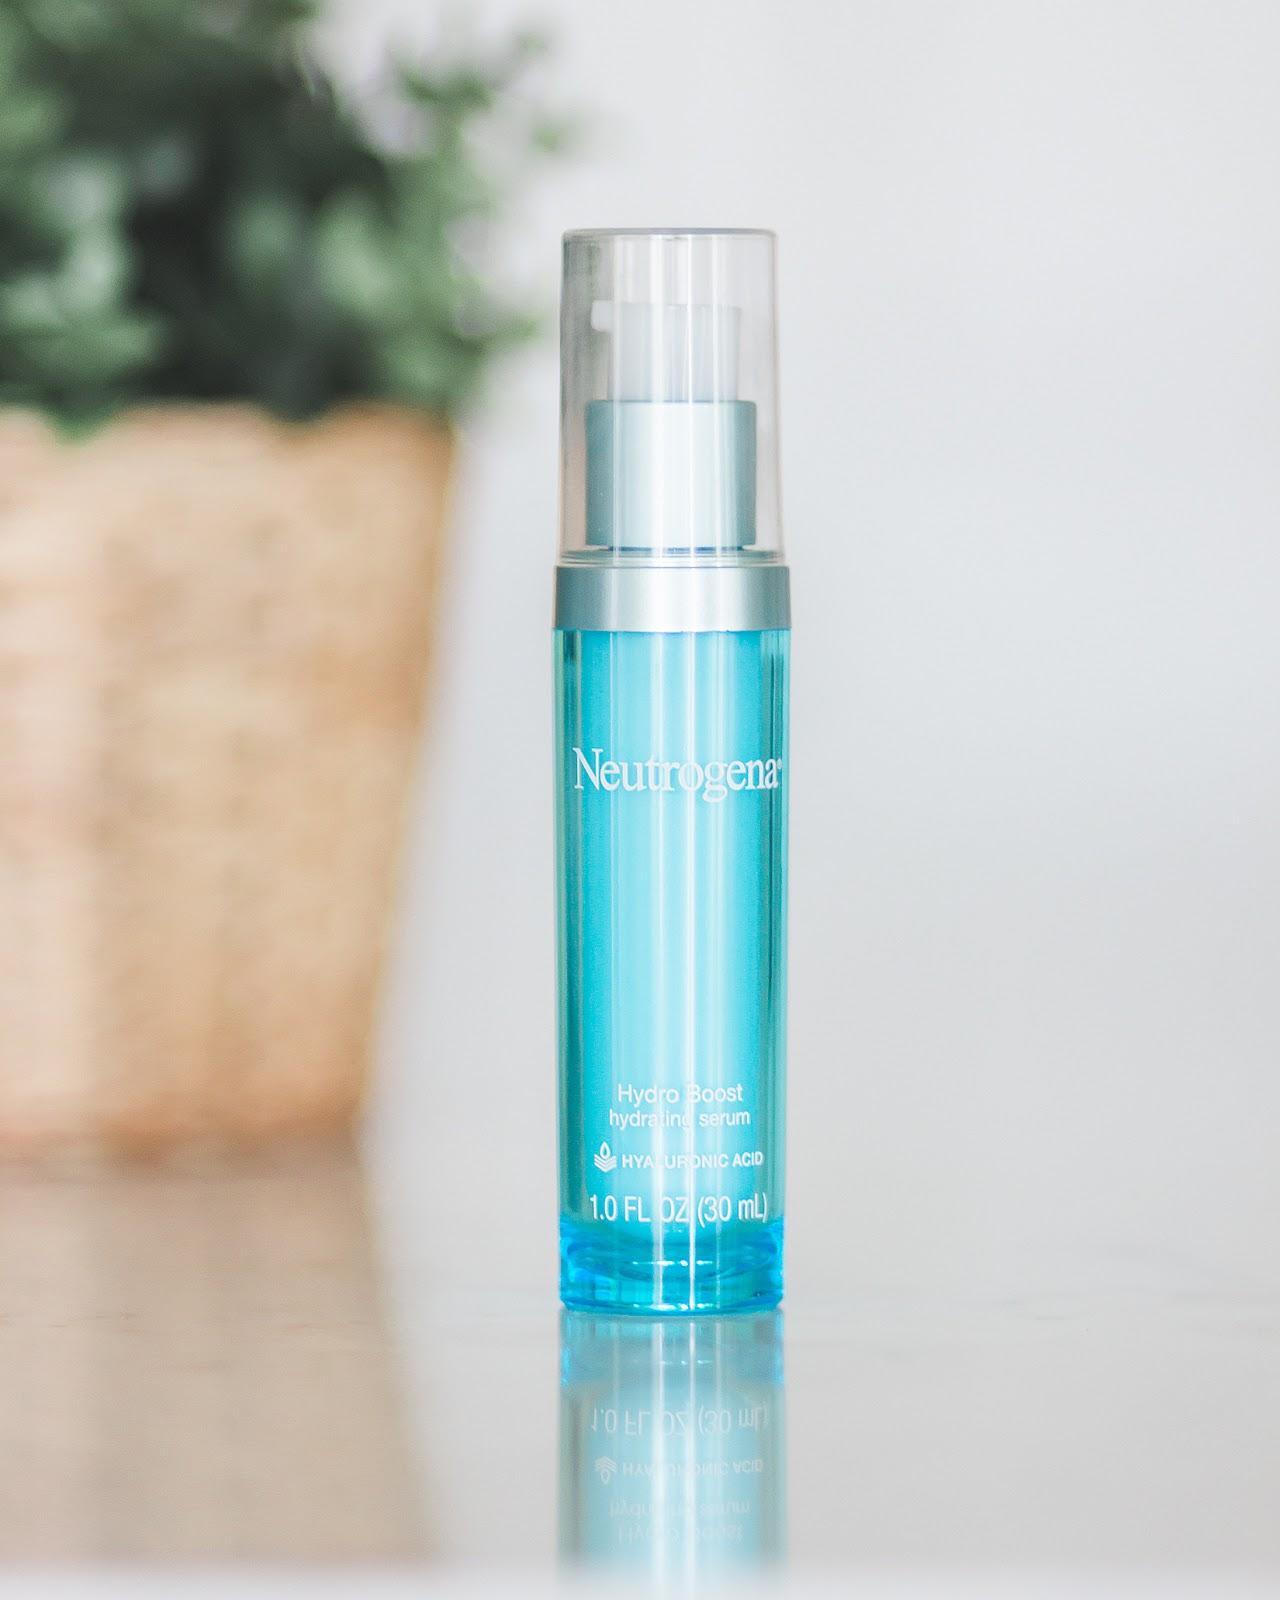 Neutrogena Hydro Boost Hydrating Serum Review